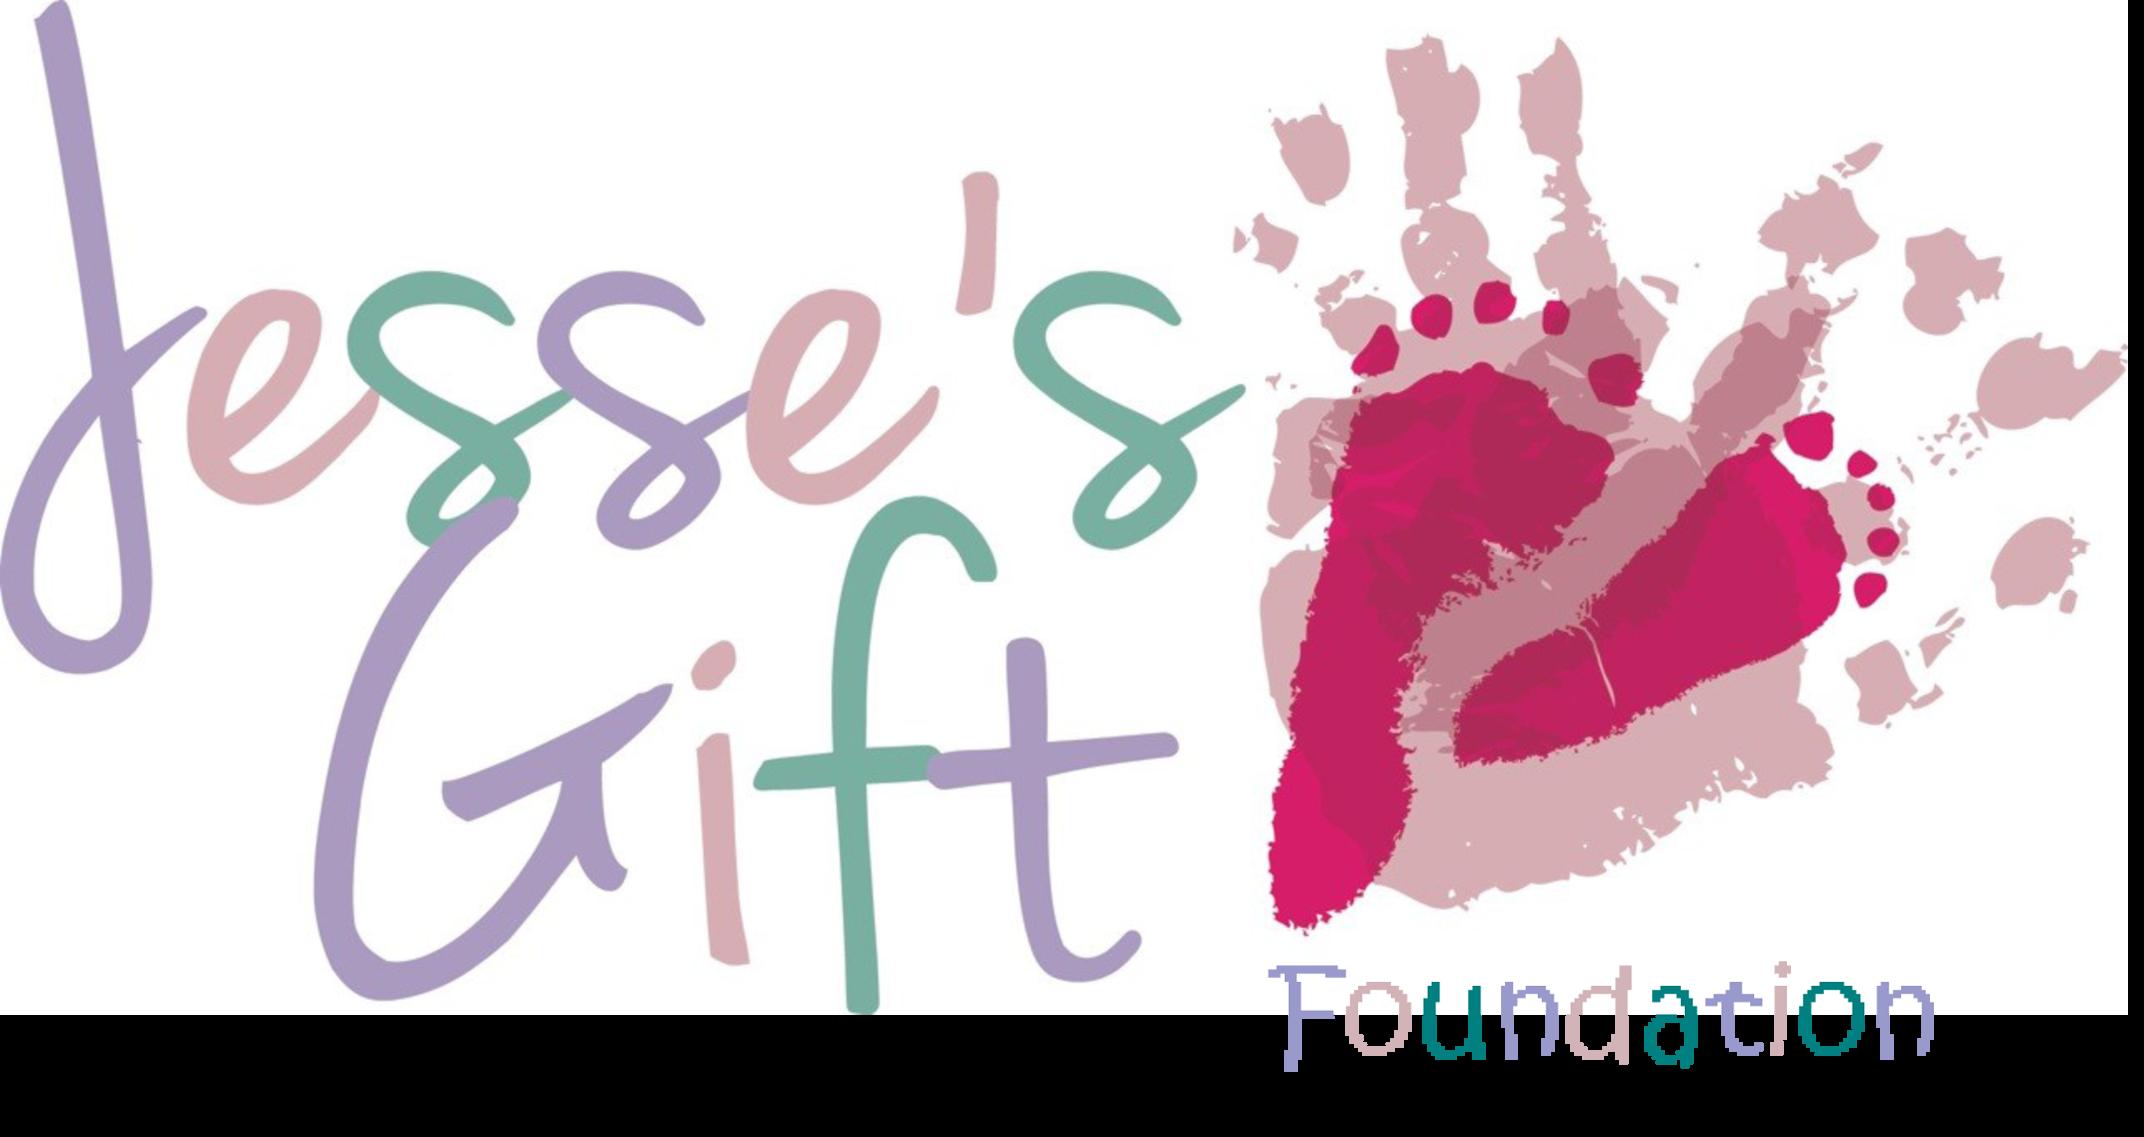 Jesse's Gift Foundation